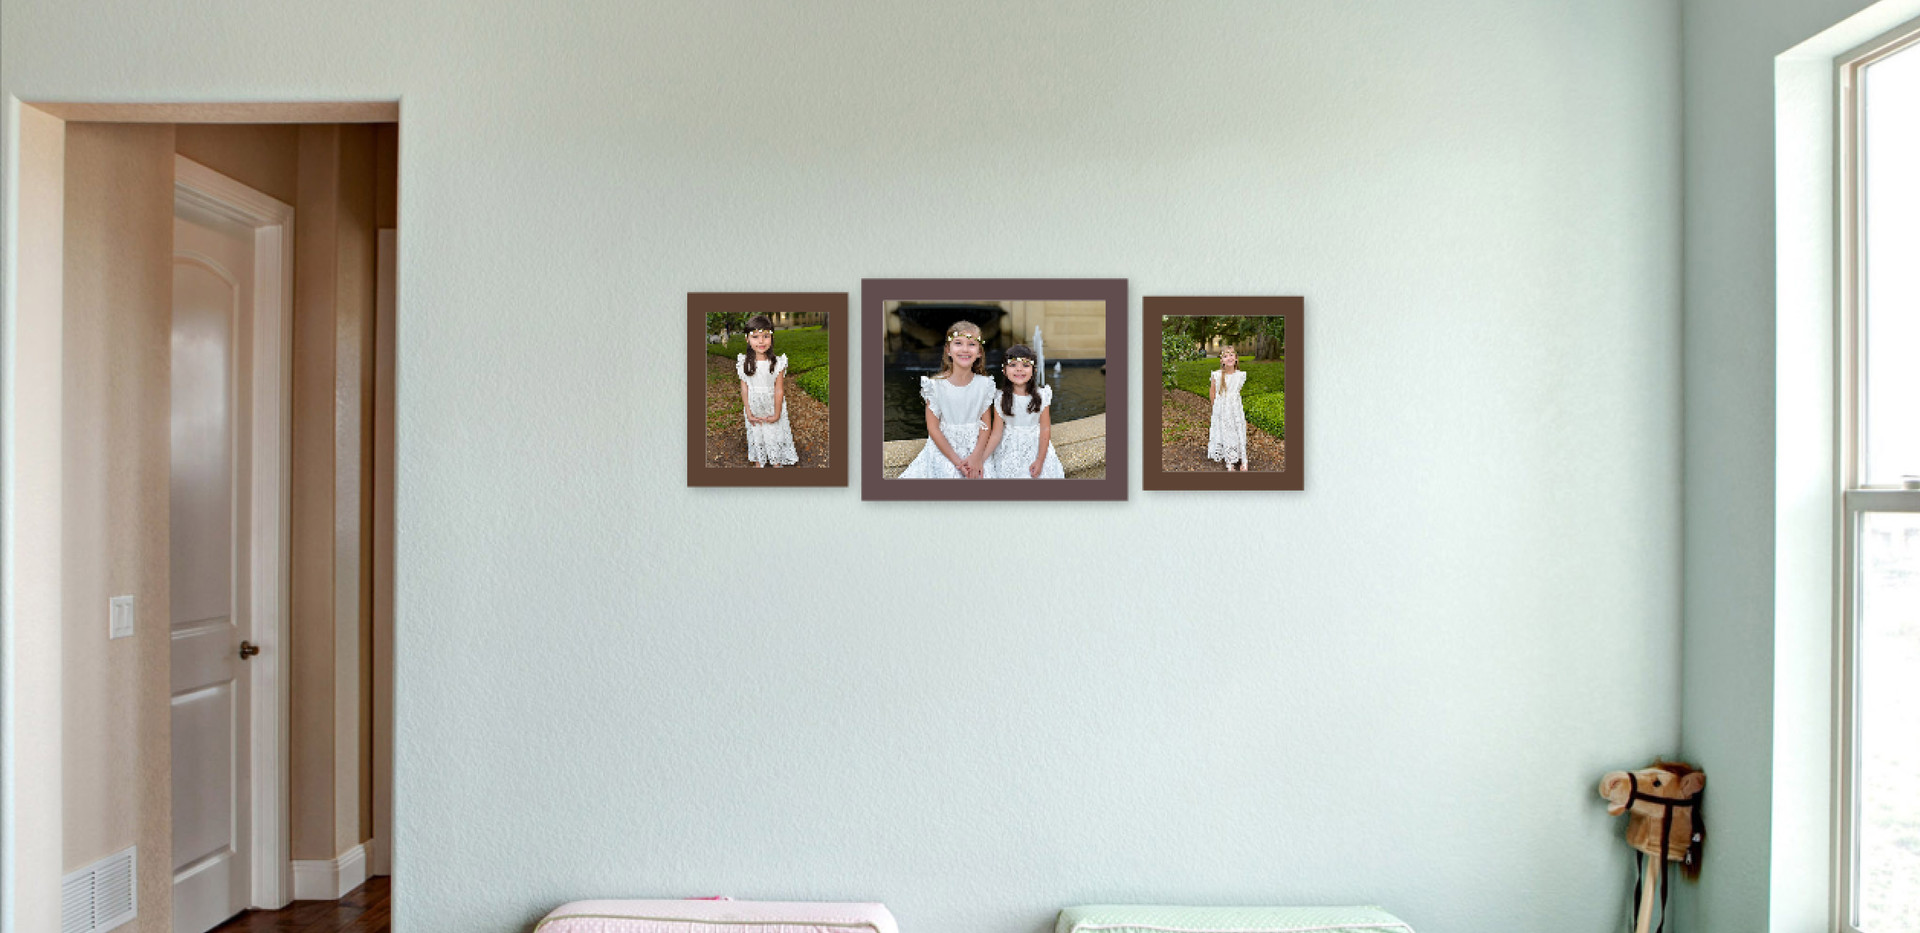 Play room portrait gallery